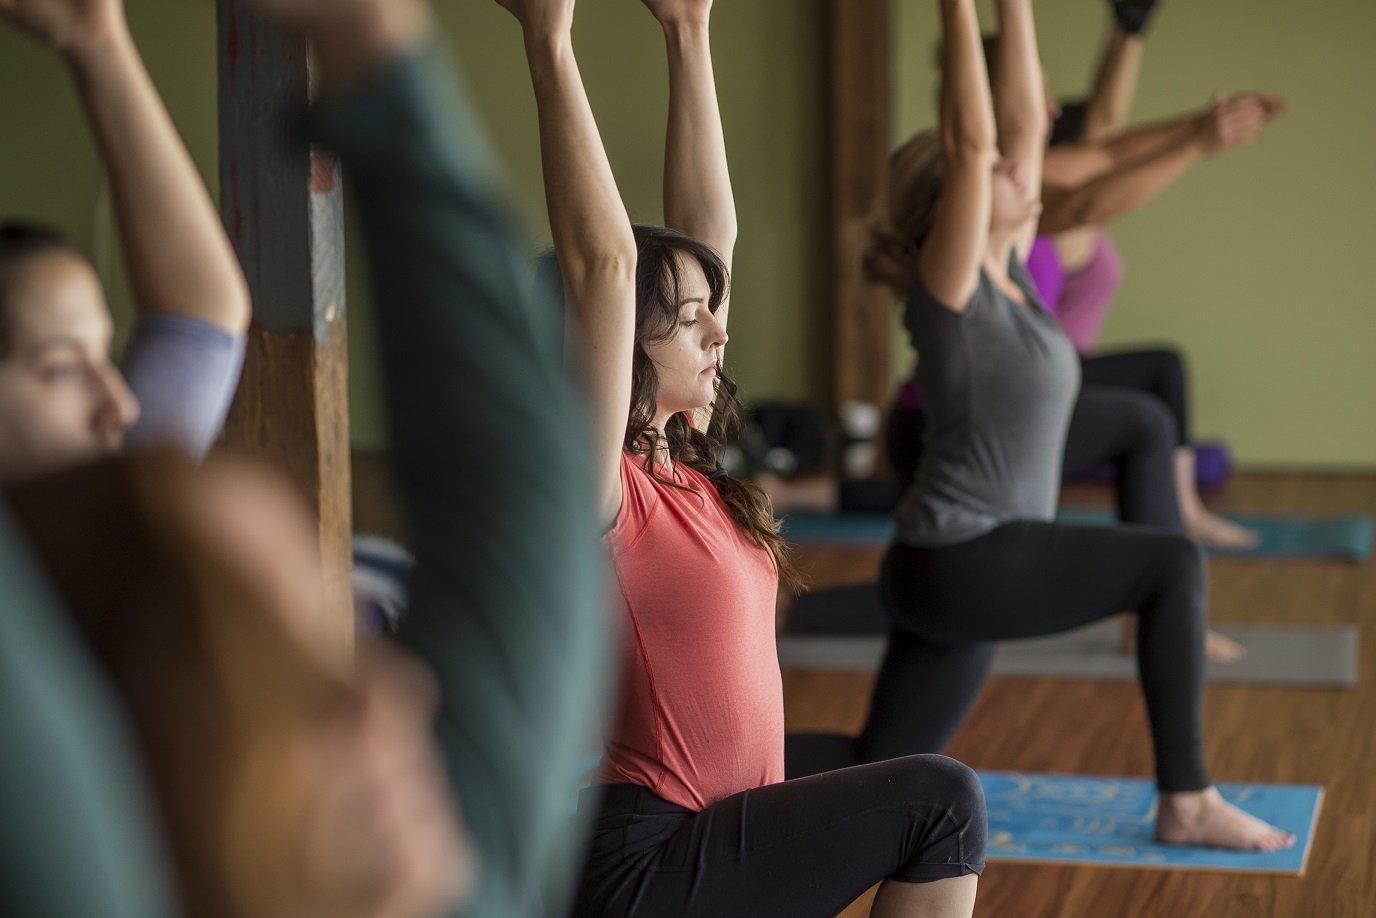 March 28: Beginner Yoga 101 Series – Whole Body Yoga Studio